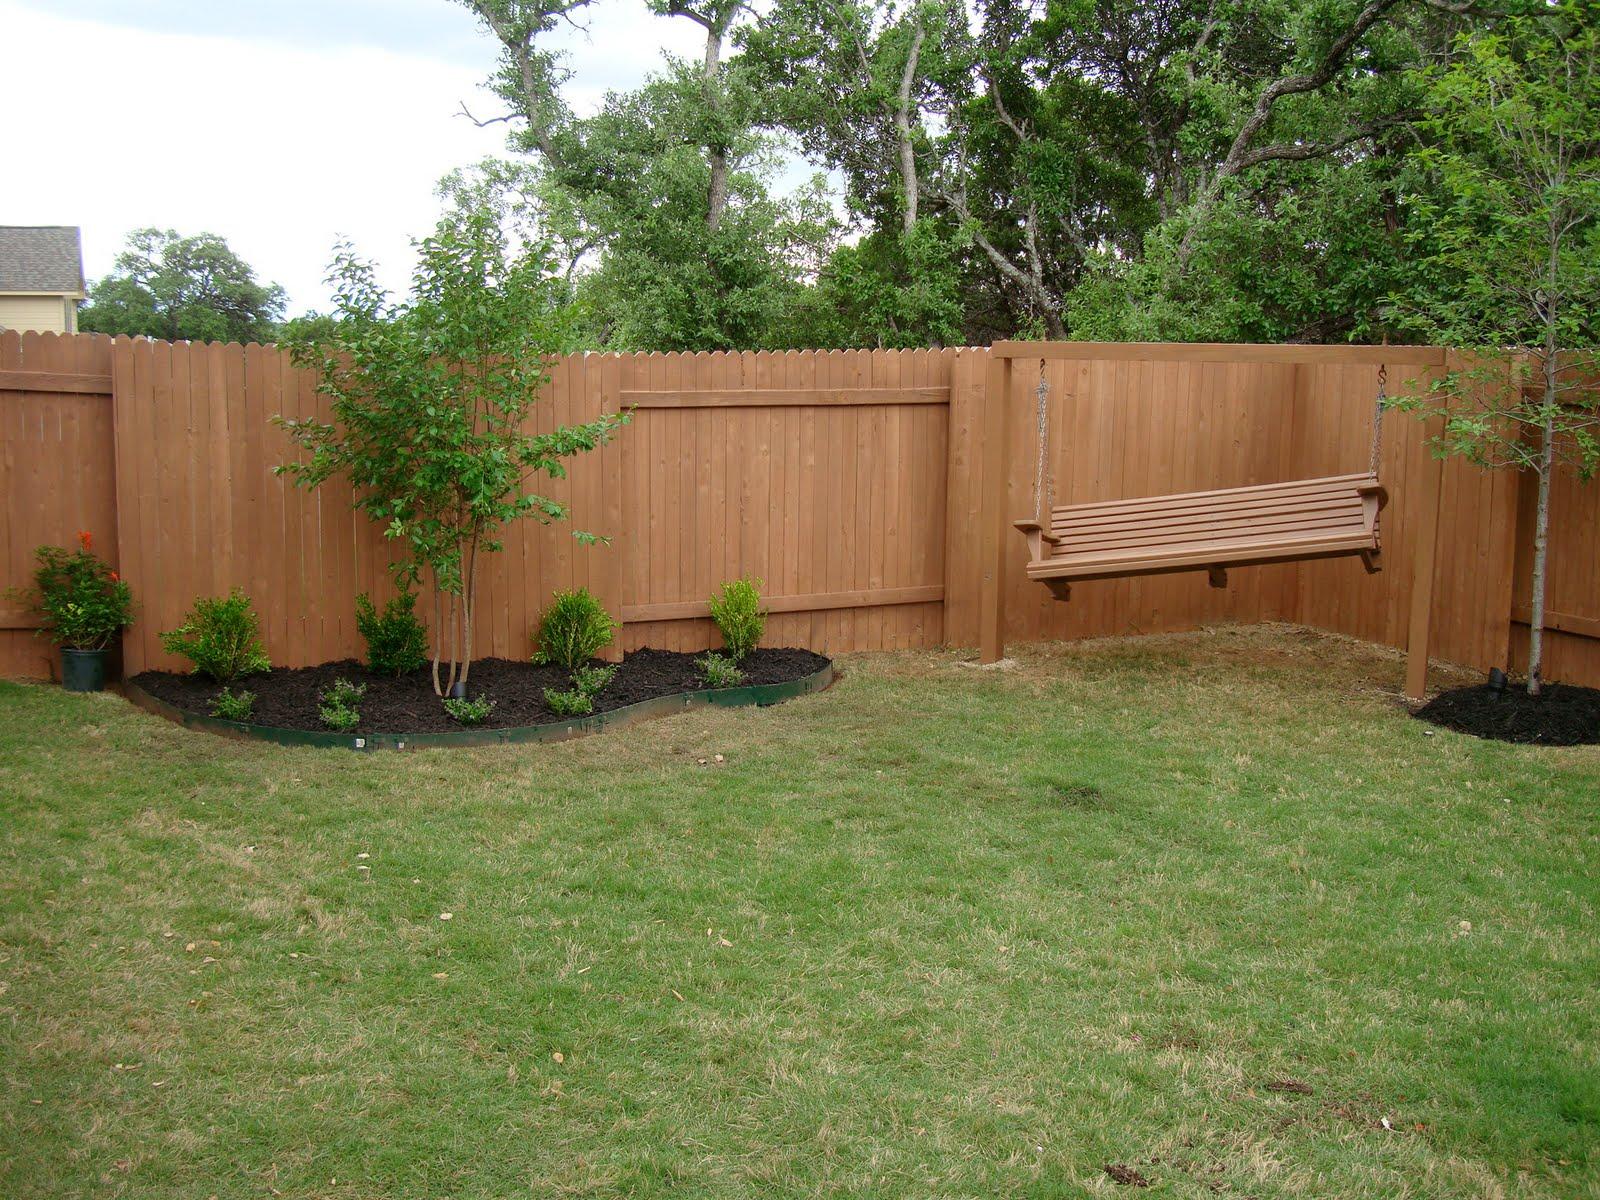 Easy Backyard Designs Photo Design Your Home - Backyard design ideas on a budget